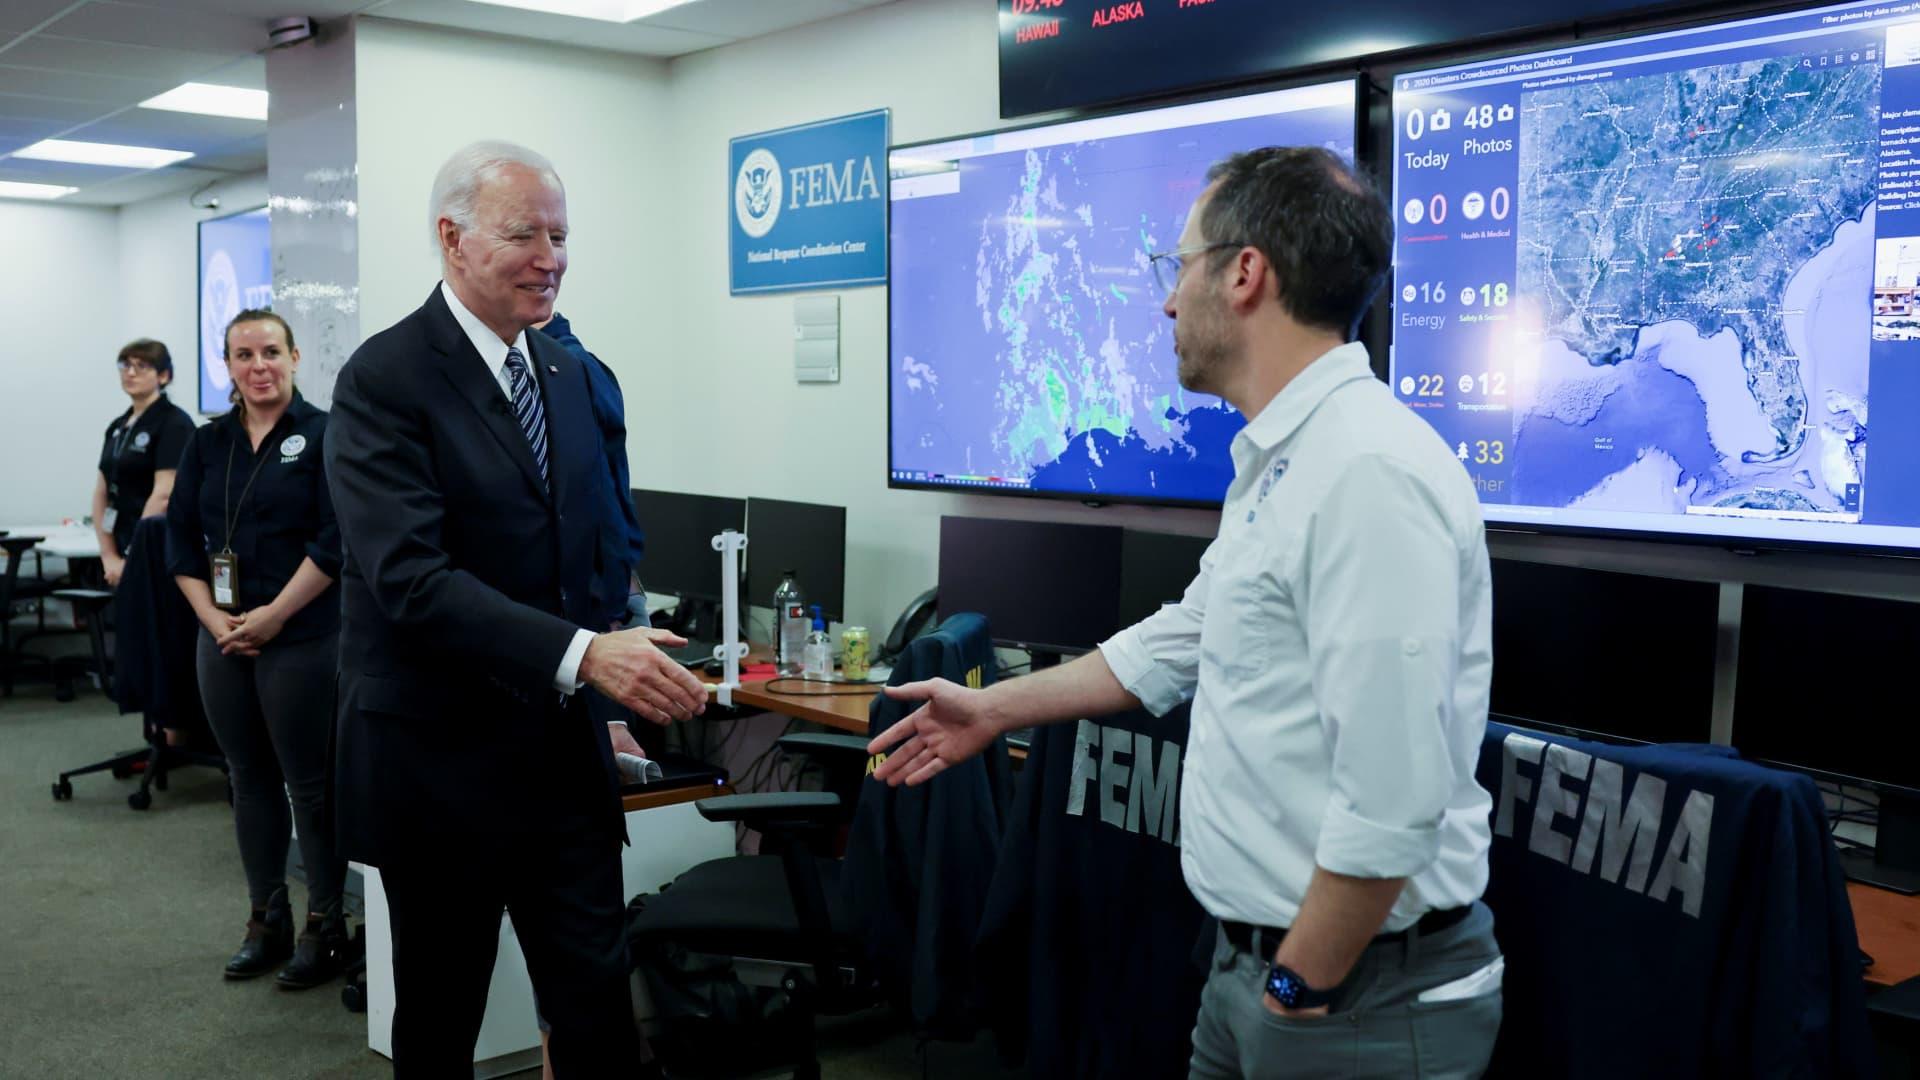 U.S. President Joe Biden greets Federal Emergency Management Agency (FEMA) staff as he visits its headquarters to receive a briefing on the Atlantic hurricane season, in Washington, May 24, 2021.